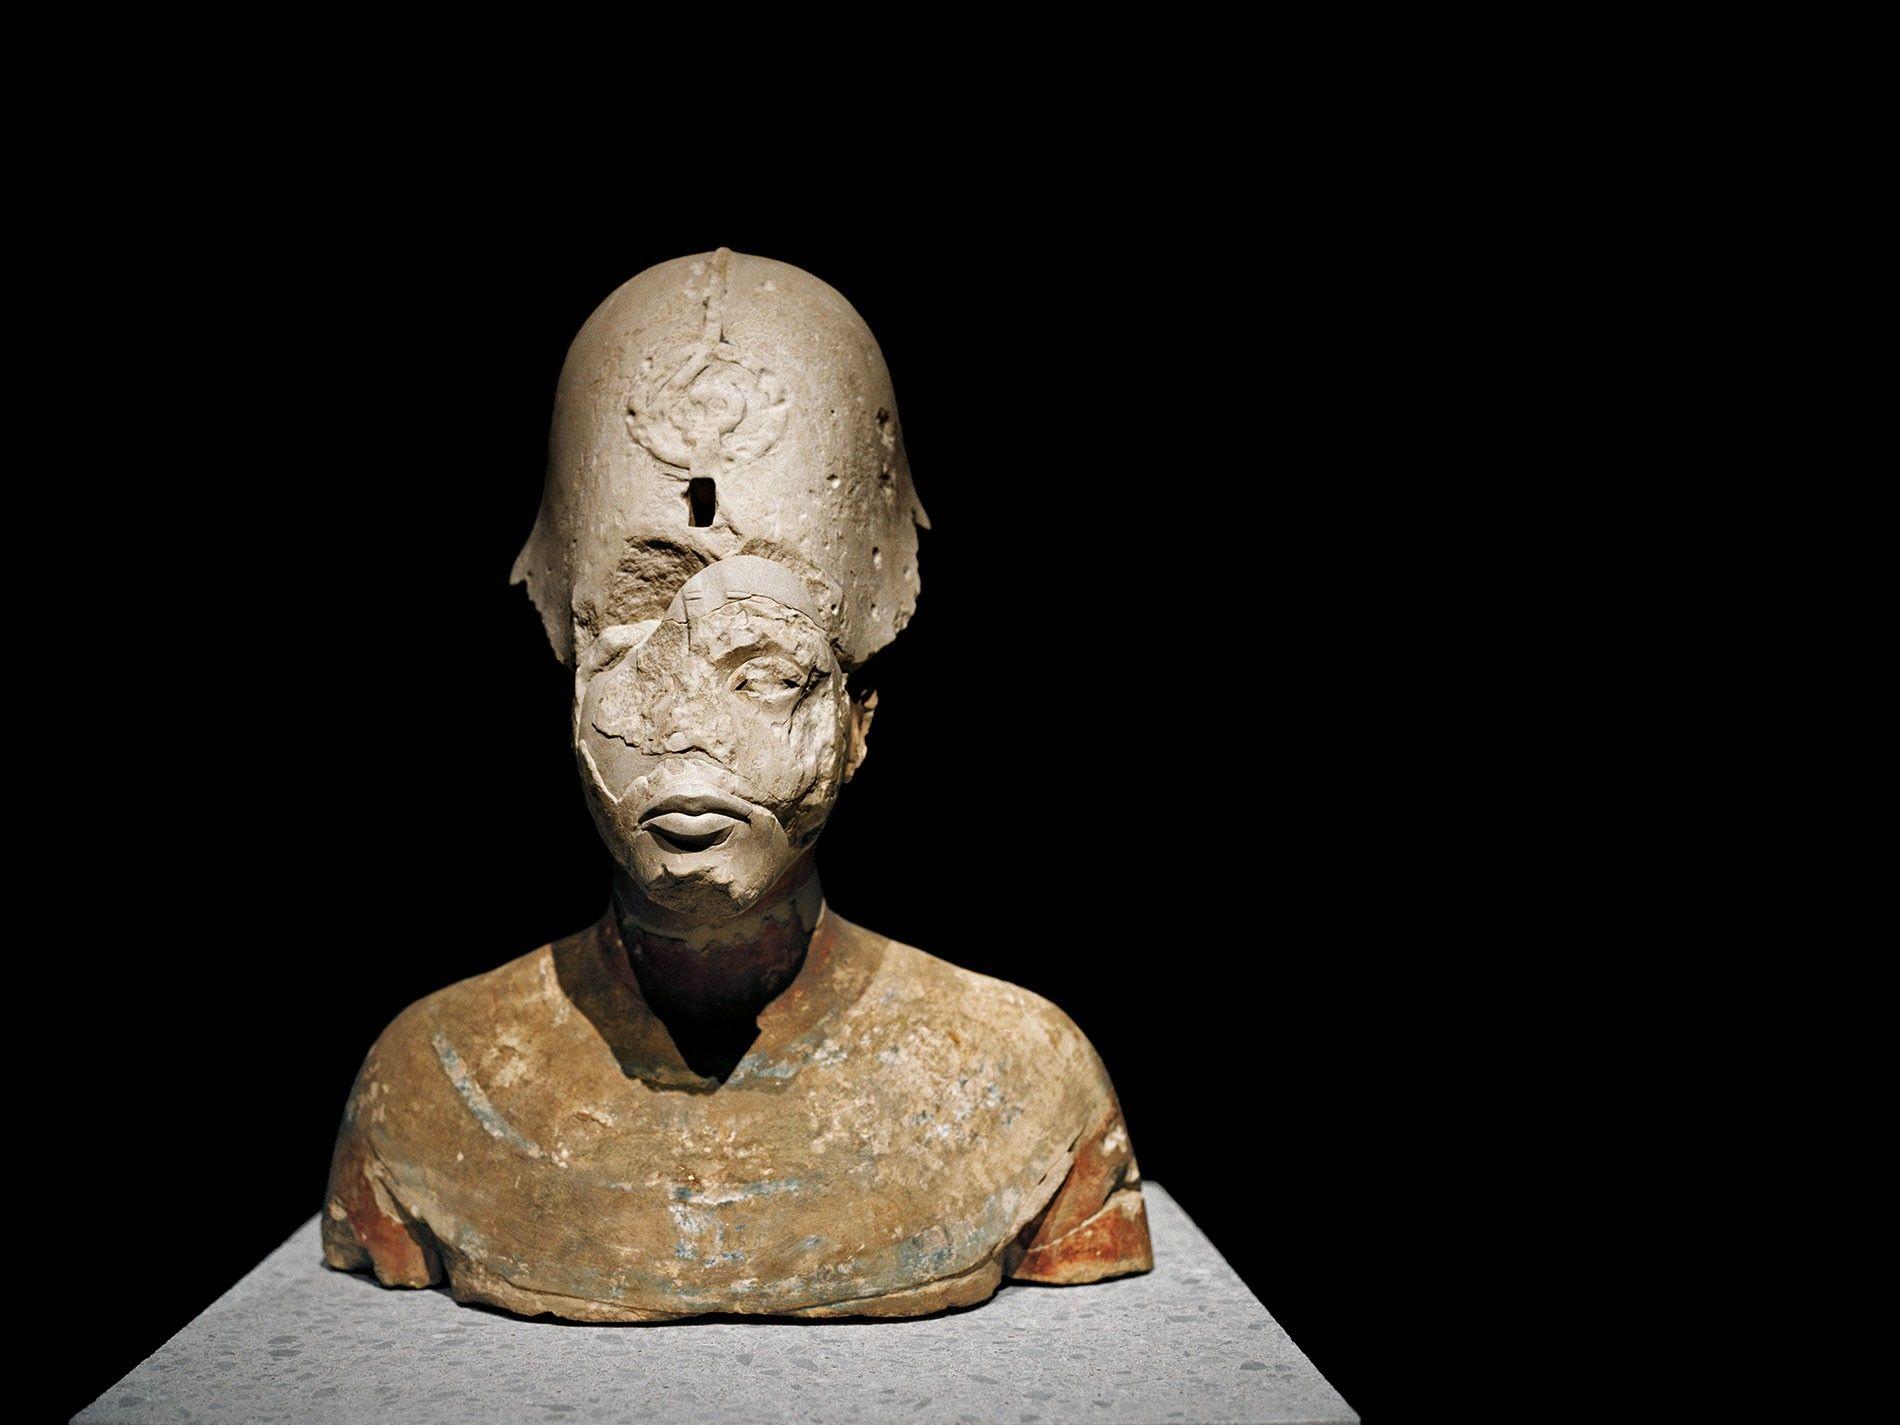 Galerie: Echnaton – Ägyptens erster Revolutionär | National Geographic